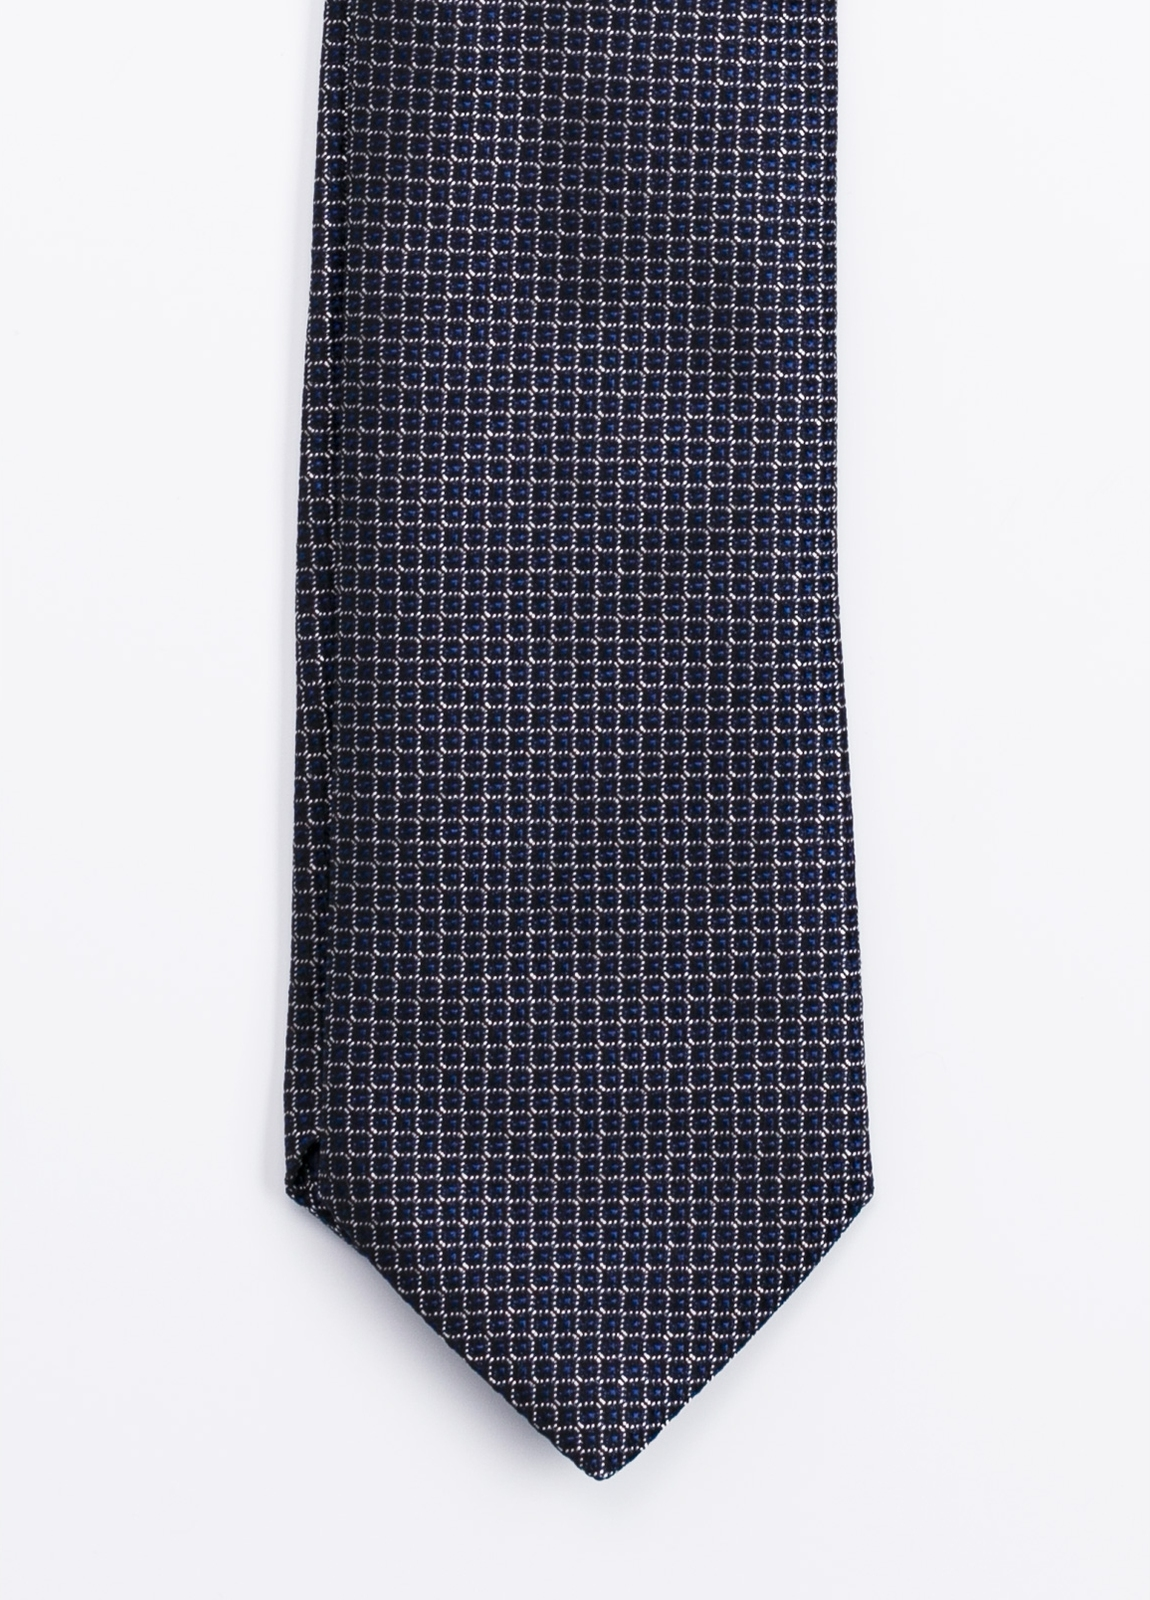 Corbata Formal Wear microdibujo, color azul marino. Pala 7,5 cm. 100% Seda.